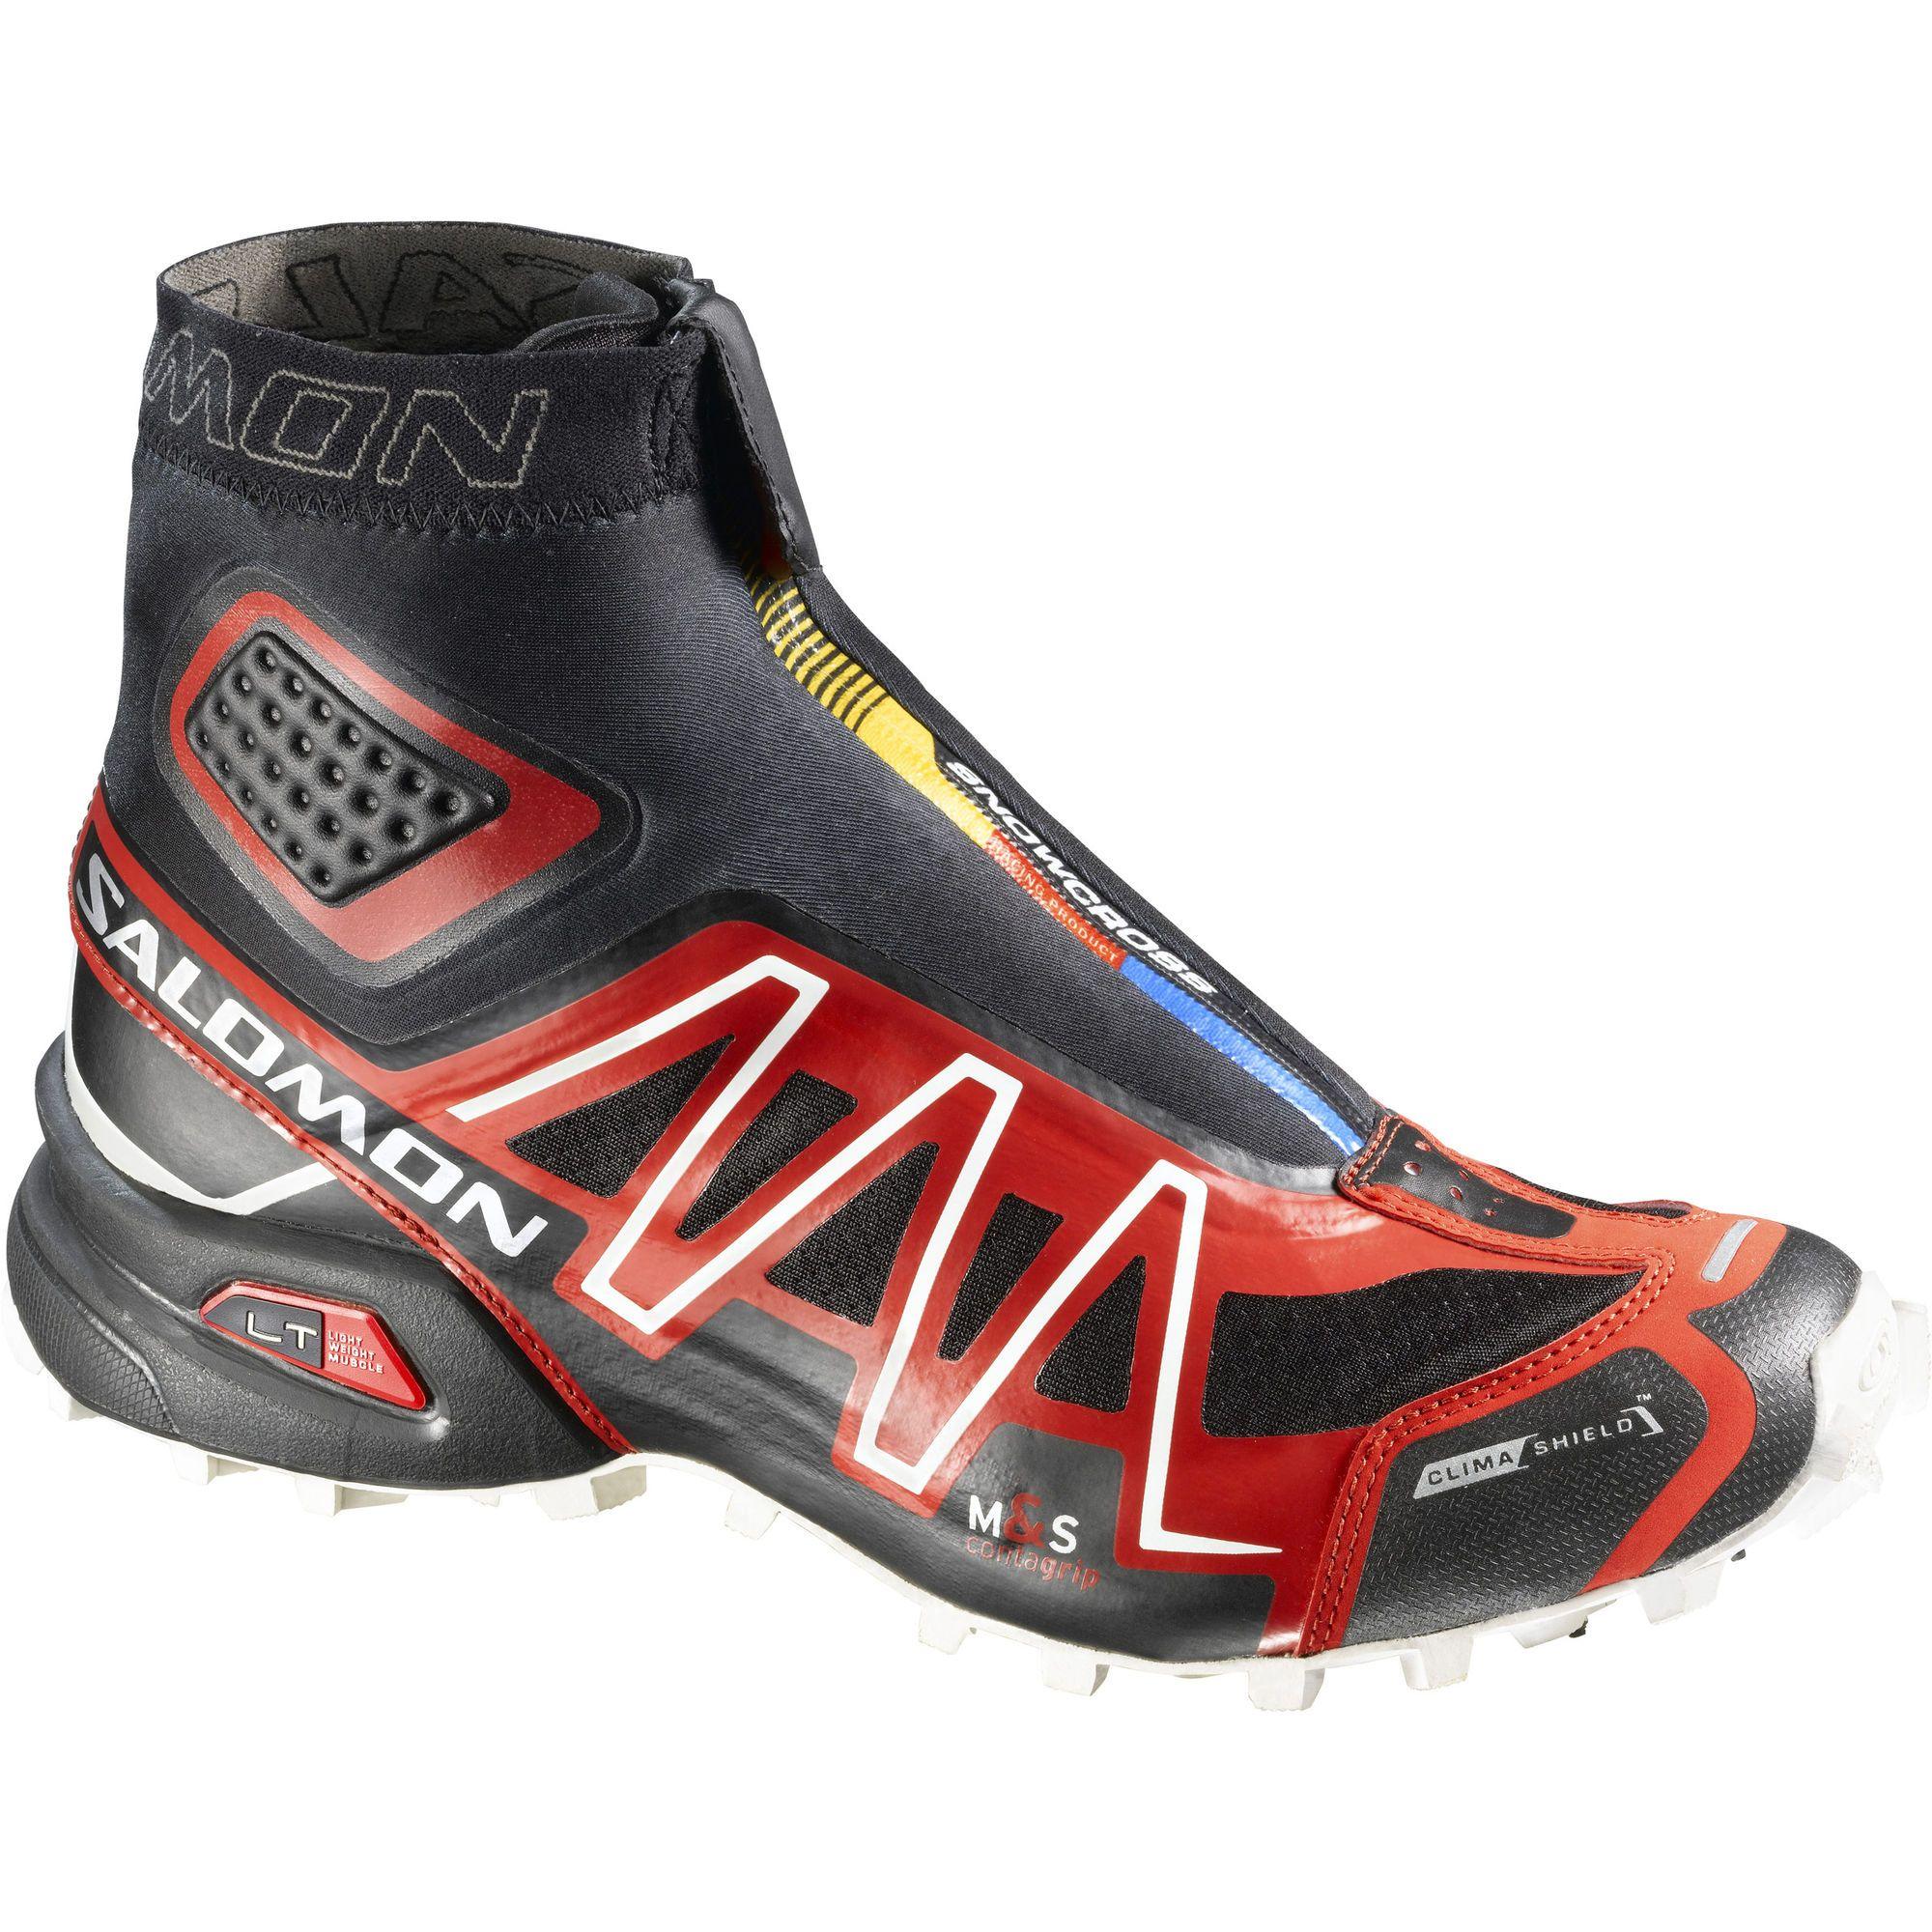 salomon snowcross cs aw13 | sneakers | Winter running shoes